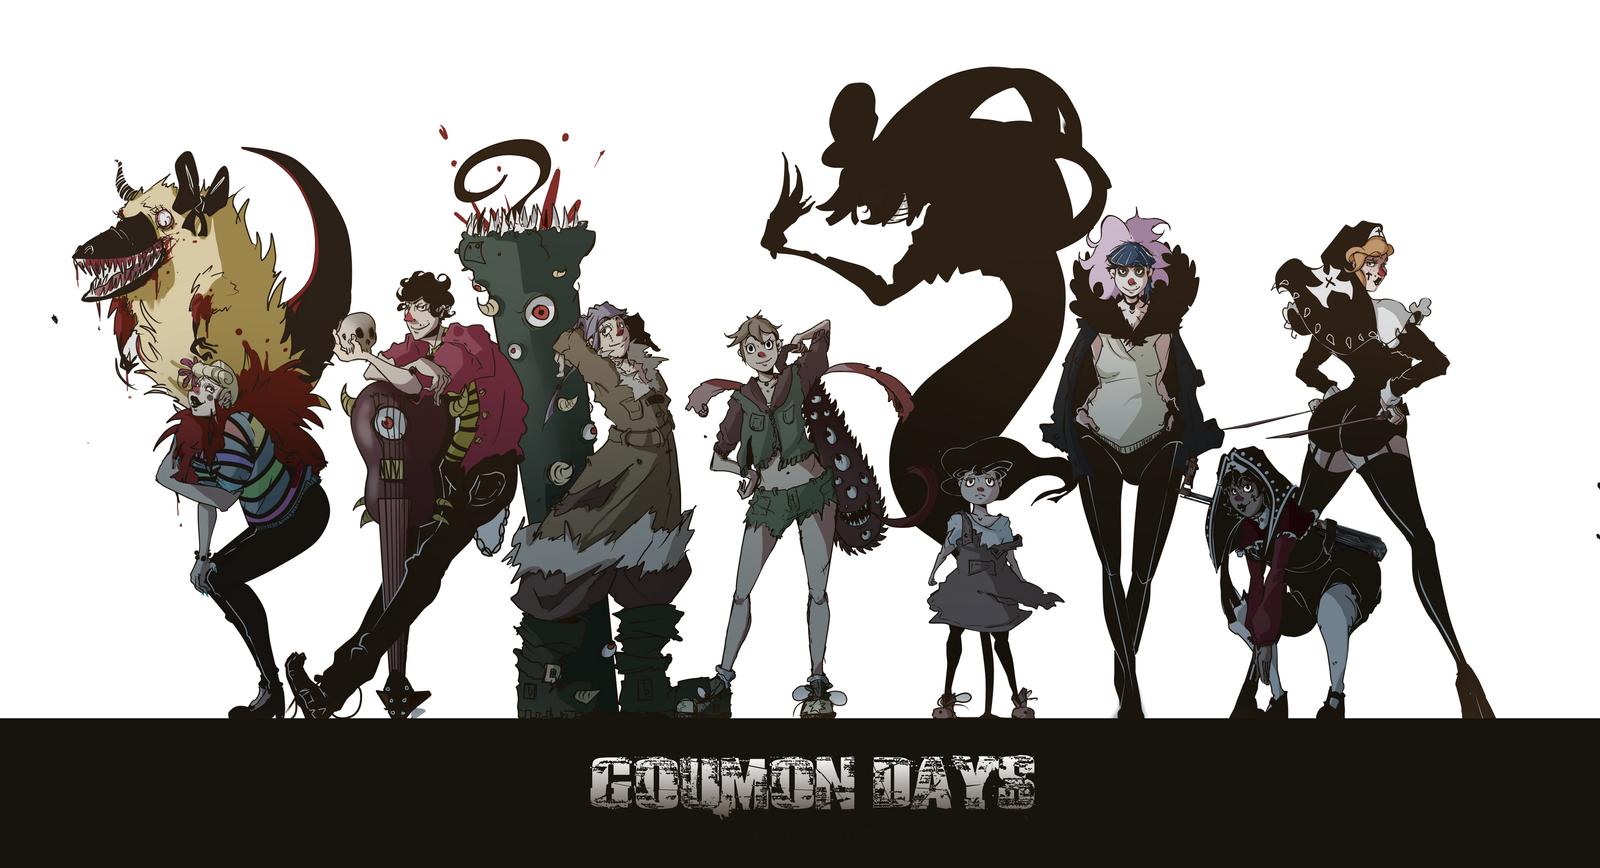 Deviantart Character Design : Goumon days original character design the alice by